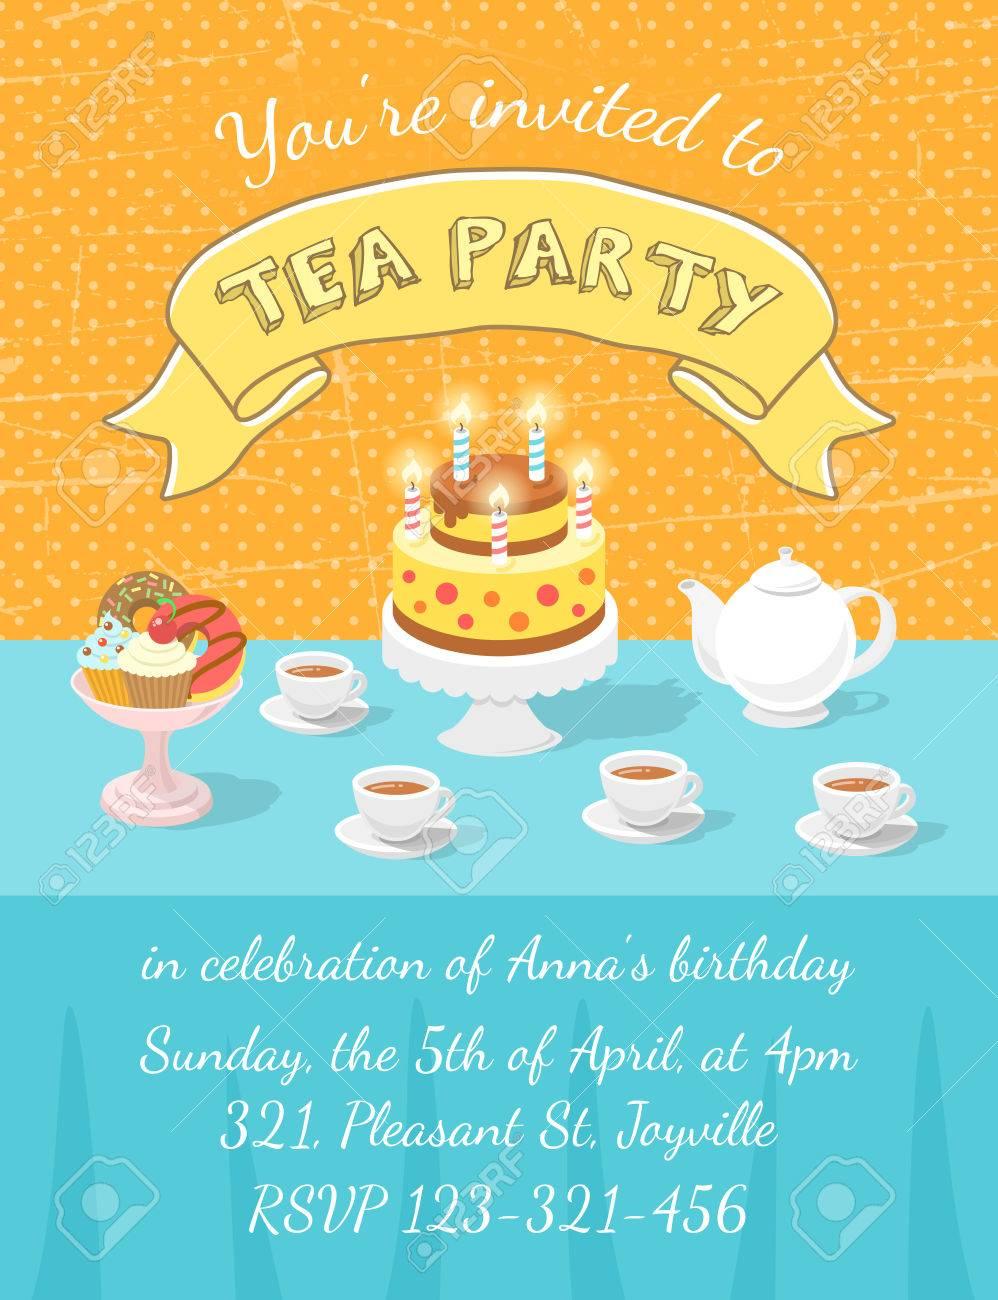 Elegant tea party invitation template with teacups cartoon vector - Modern Flat Vector Tea Party Invitation Card With Tea Cups Teapot Birthday Cake With